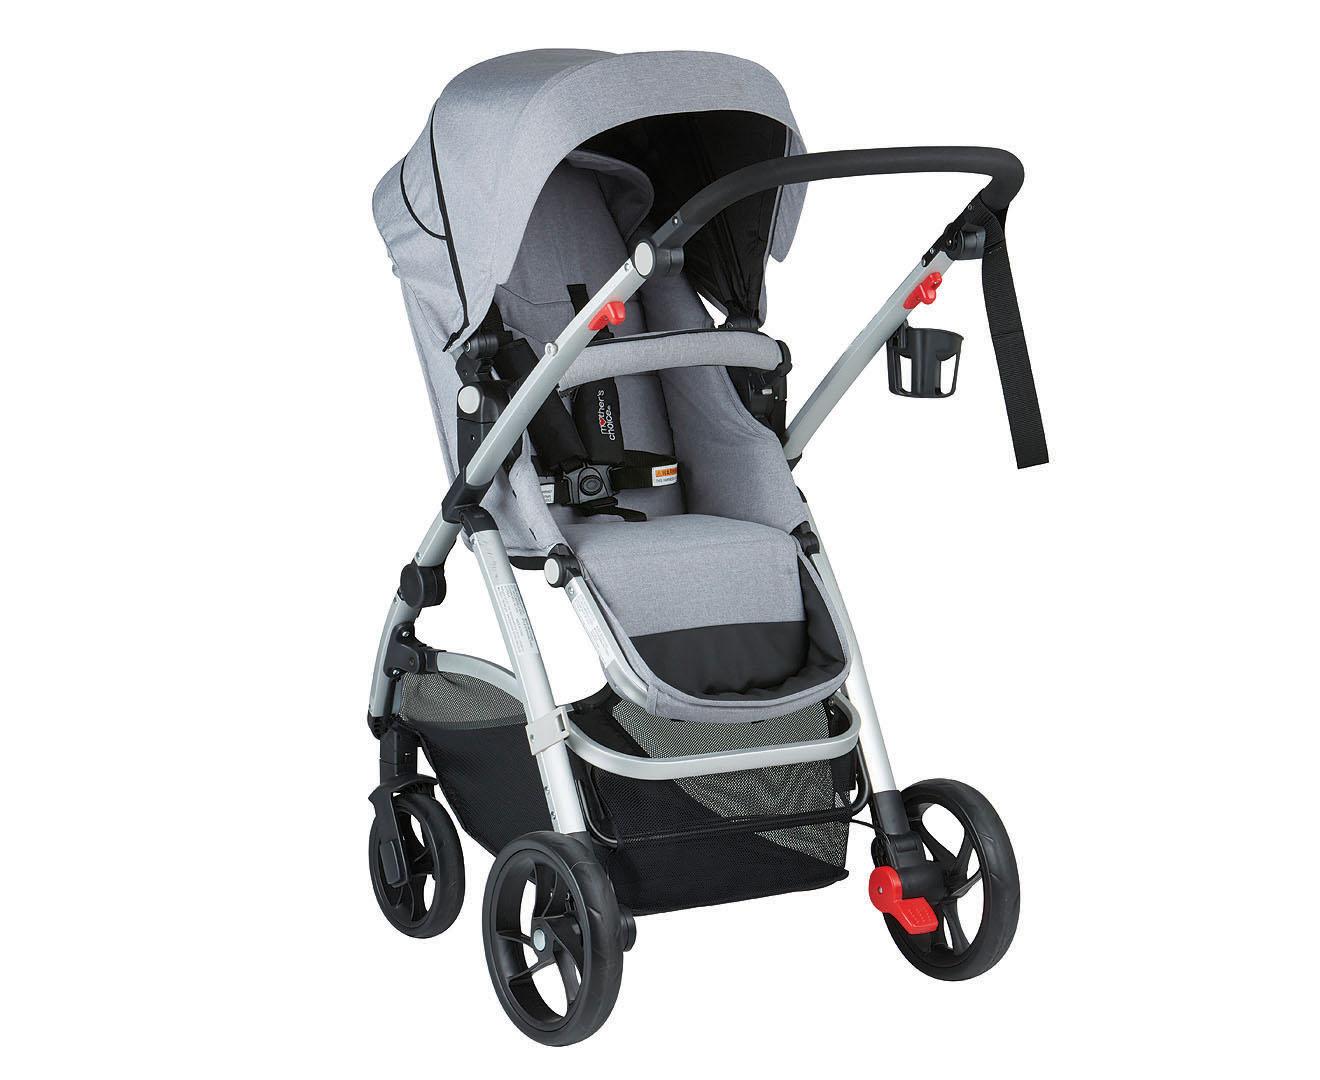 Mother's Choice Covet 4-Wheel Stroller - Grey | Mumgo.com.au